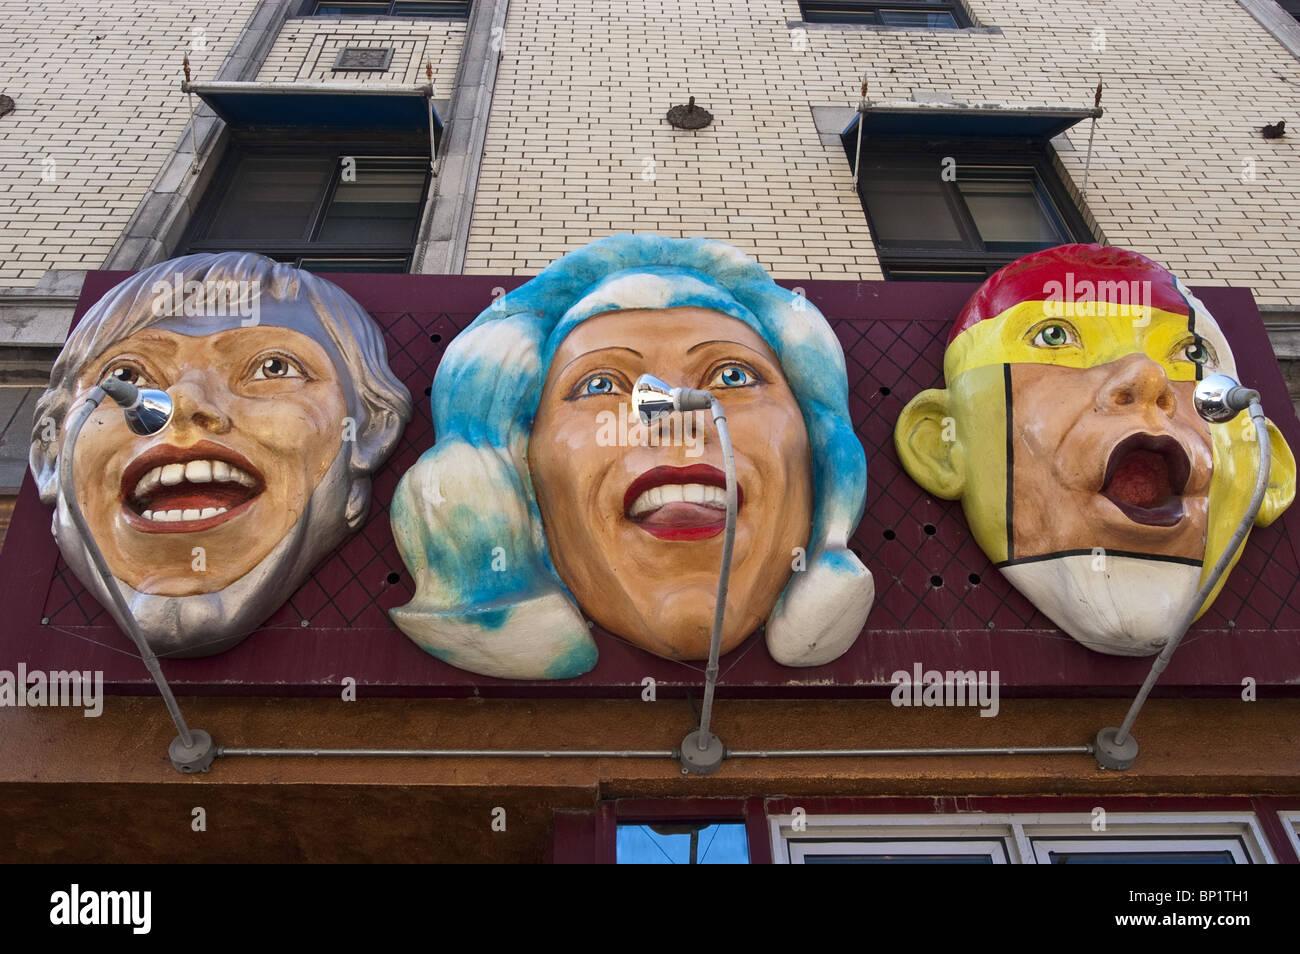 Heads sculptures at Cafe Kilo, Cafe Kilo, 1254 St-Denis, Latin Quarter, Montreal, Quebec, Canada - Stock Image